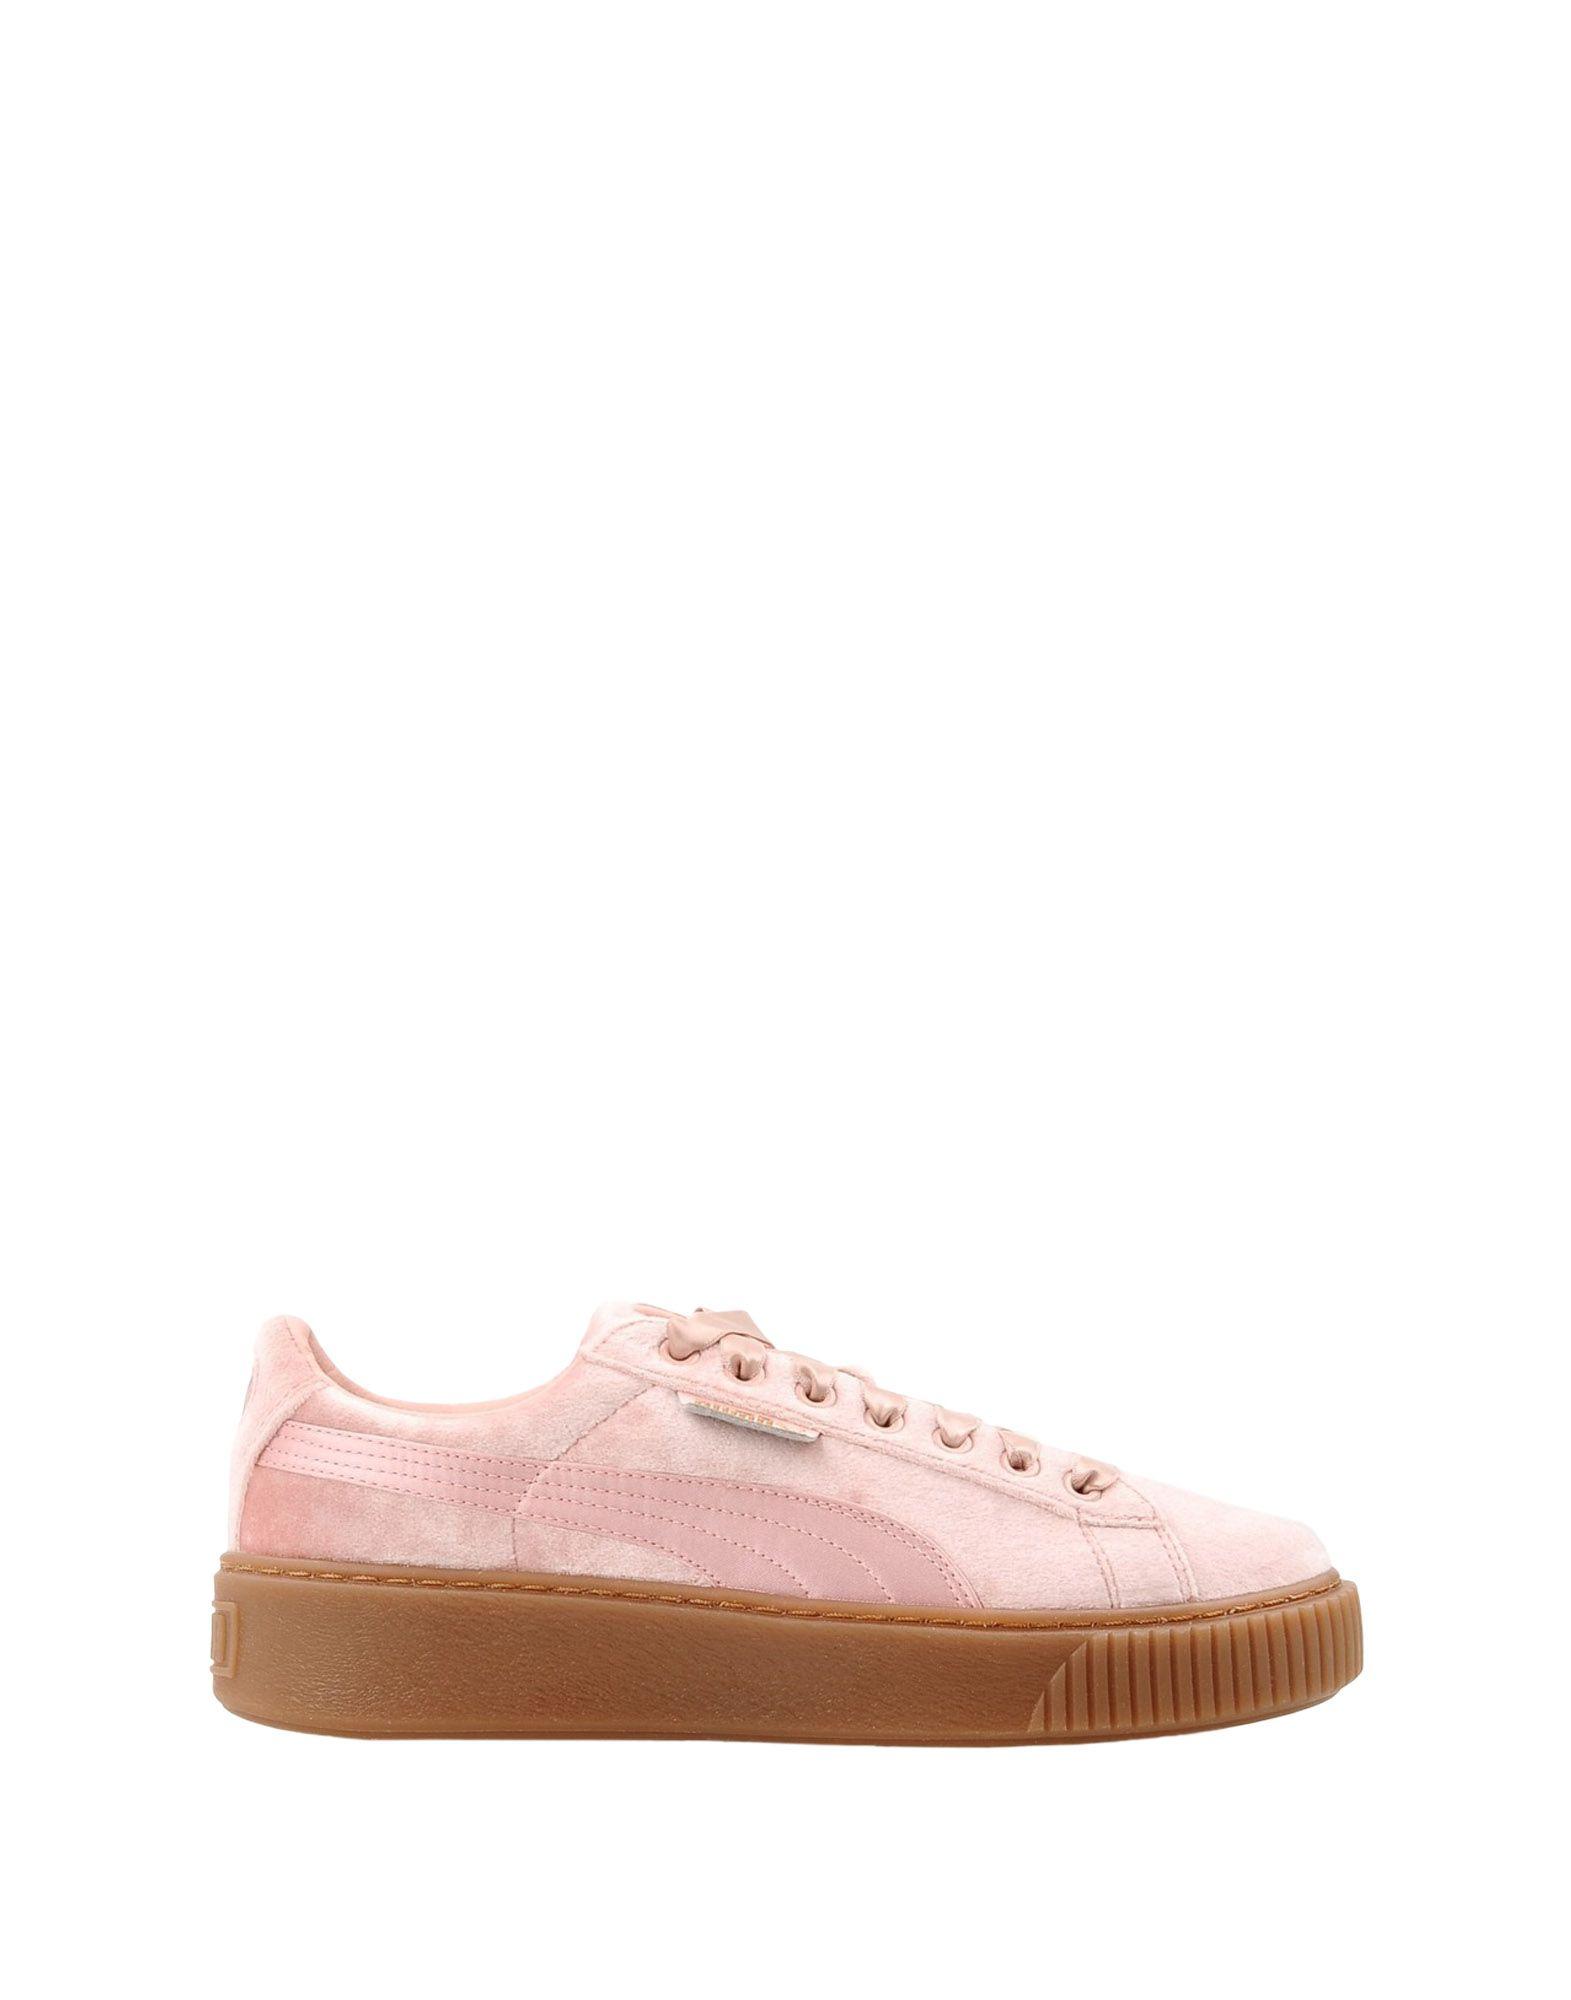 Puma Basket Platform Vs Wns - Sneakers Sneakers Sneakers - Women Puma Sneakers online on  United Kingdom - 11445002WI 3a4ead